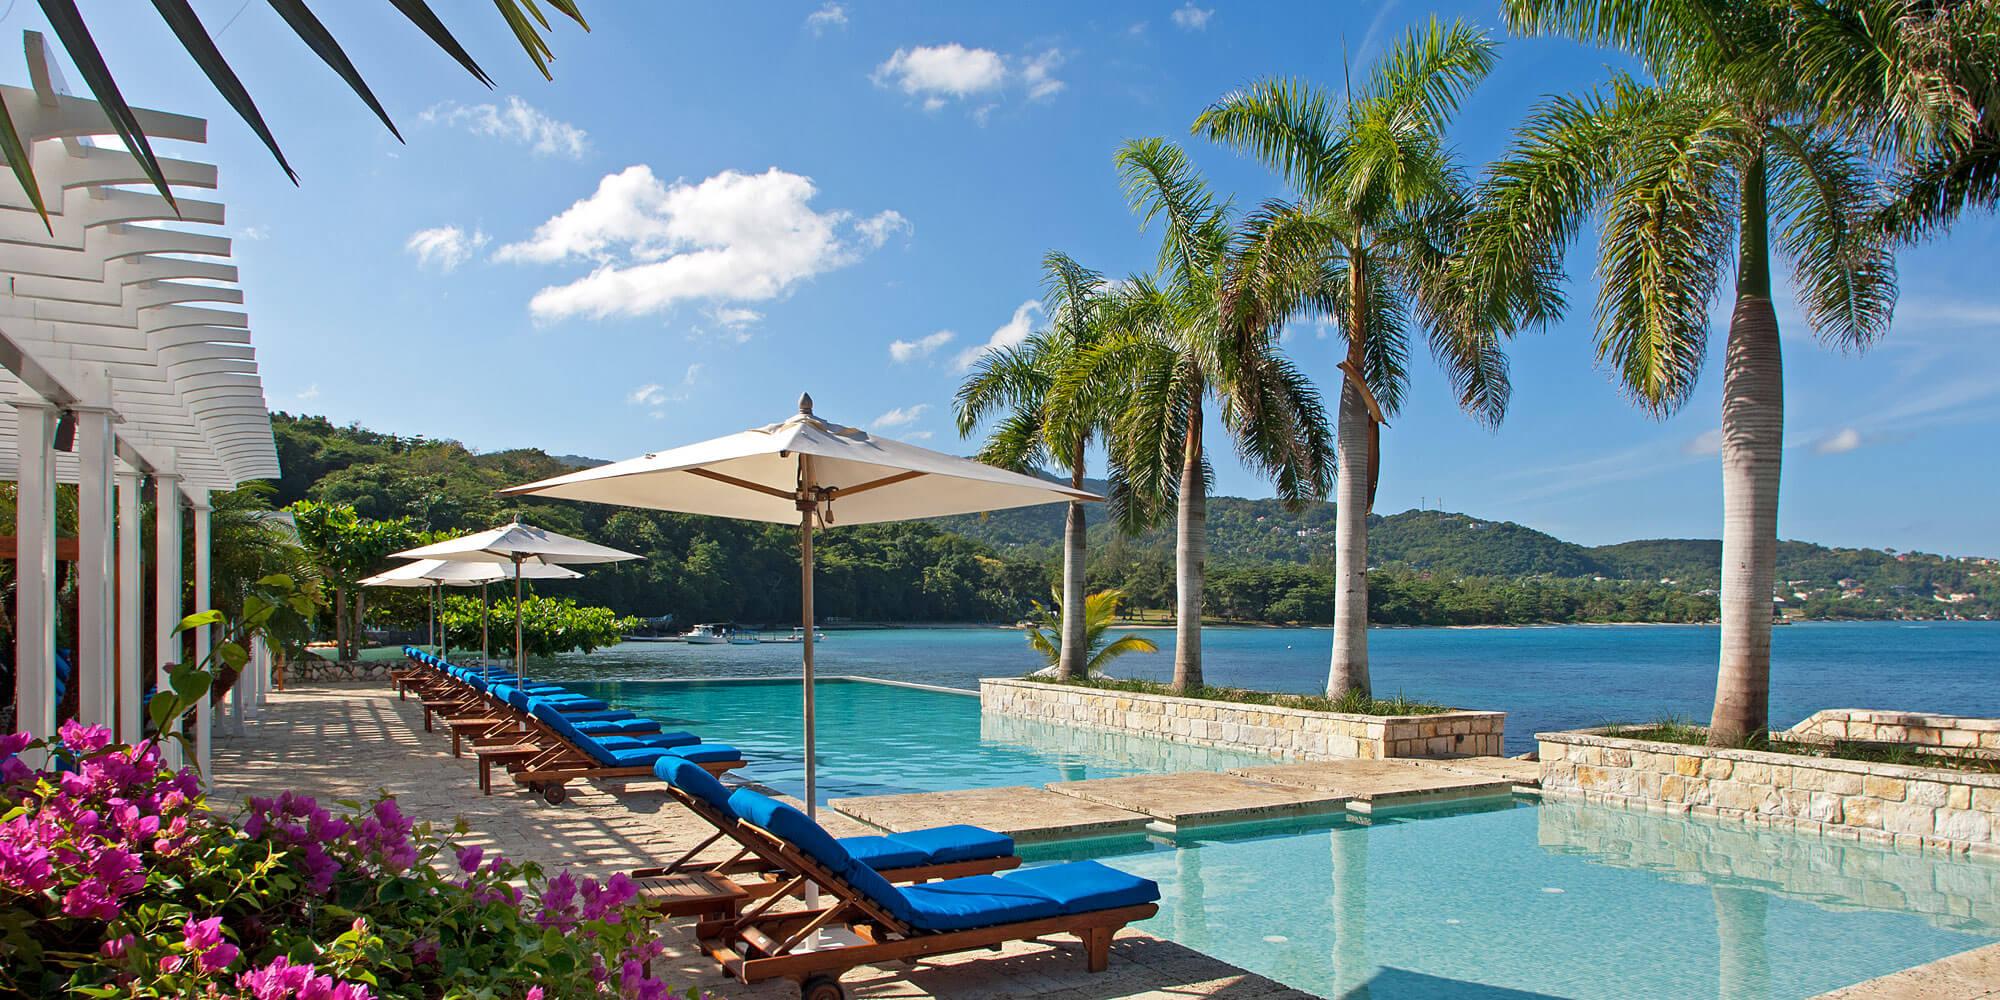 round hill hotel & villas, montego bay, jamaica hotel reviews